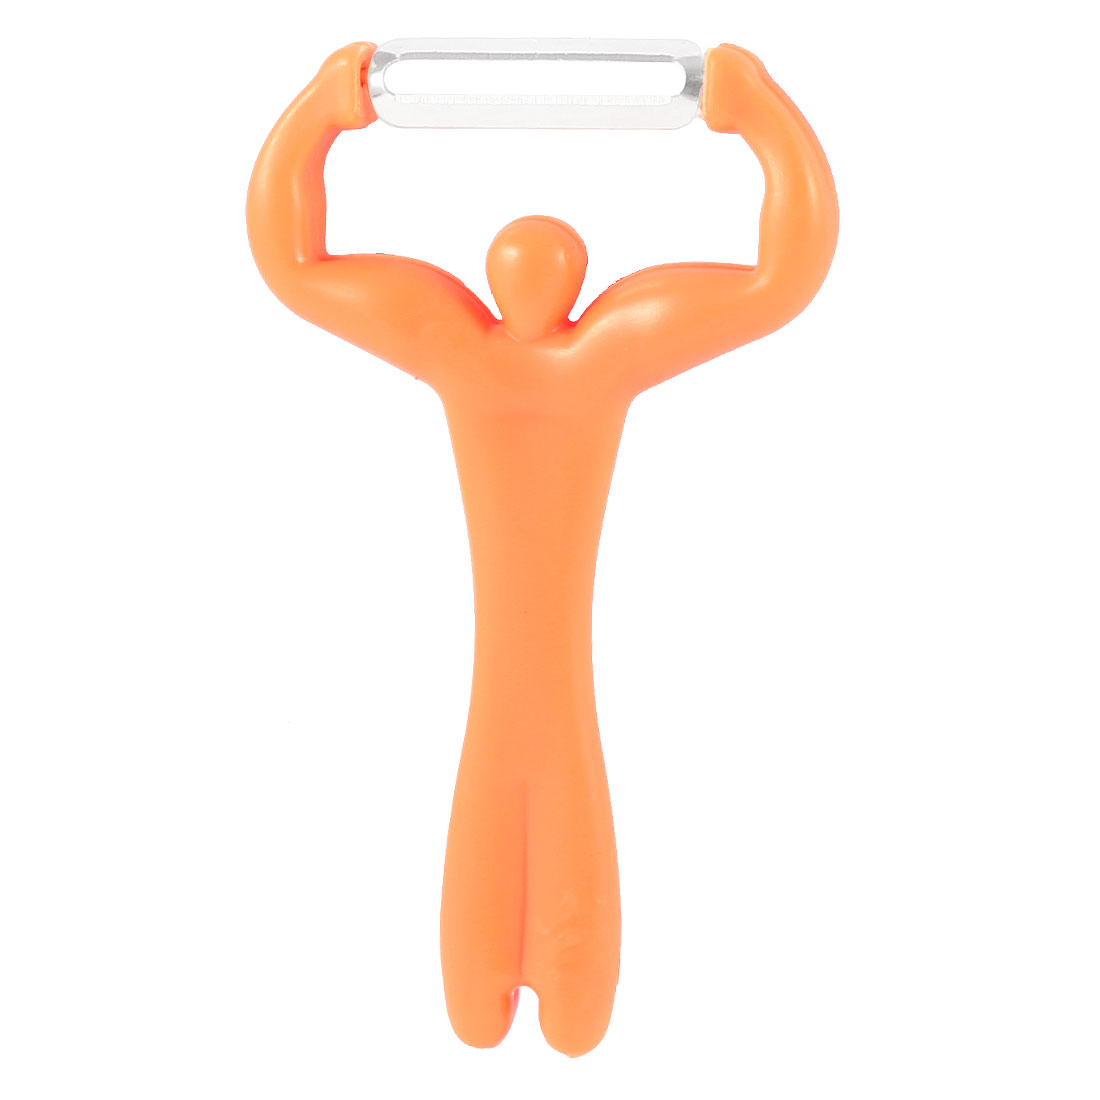 Man Design Stainless Steel Peeler Parer Clear Orange for Fruits Vegetable